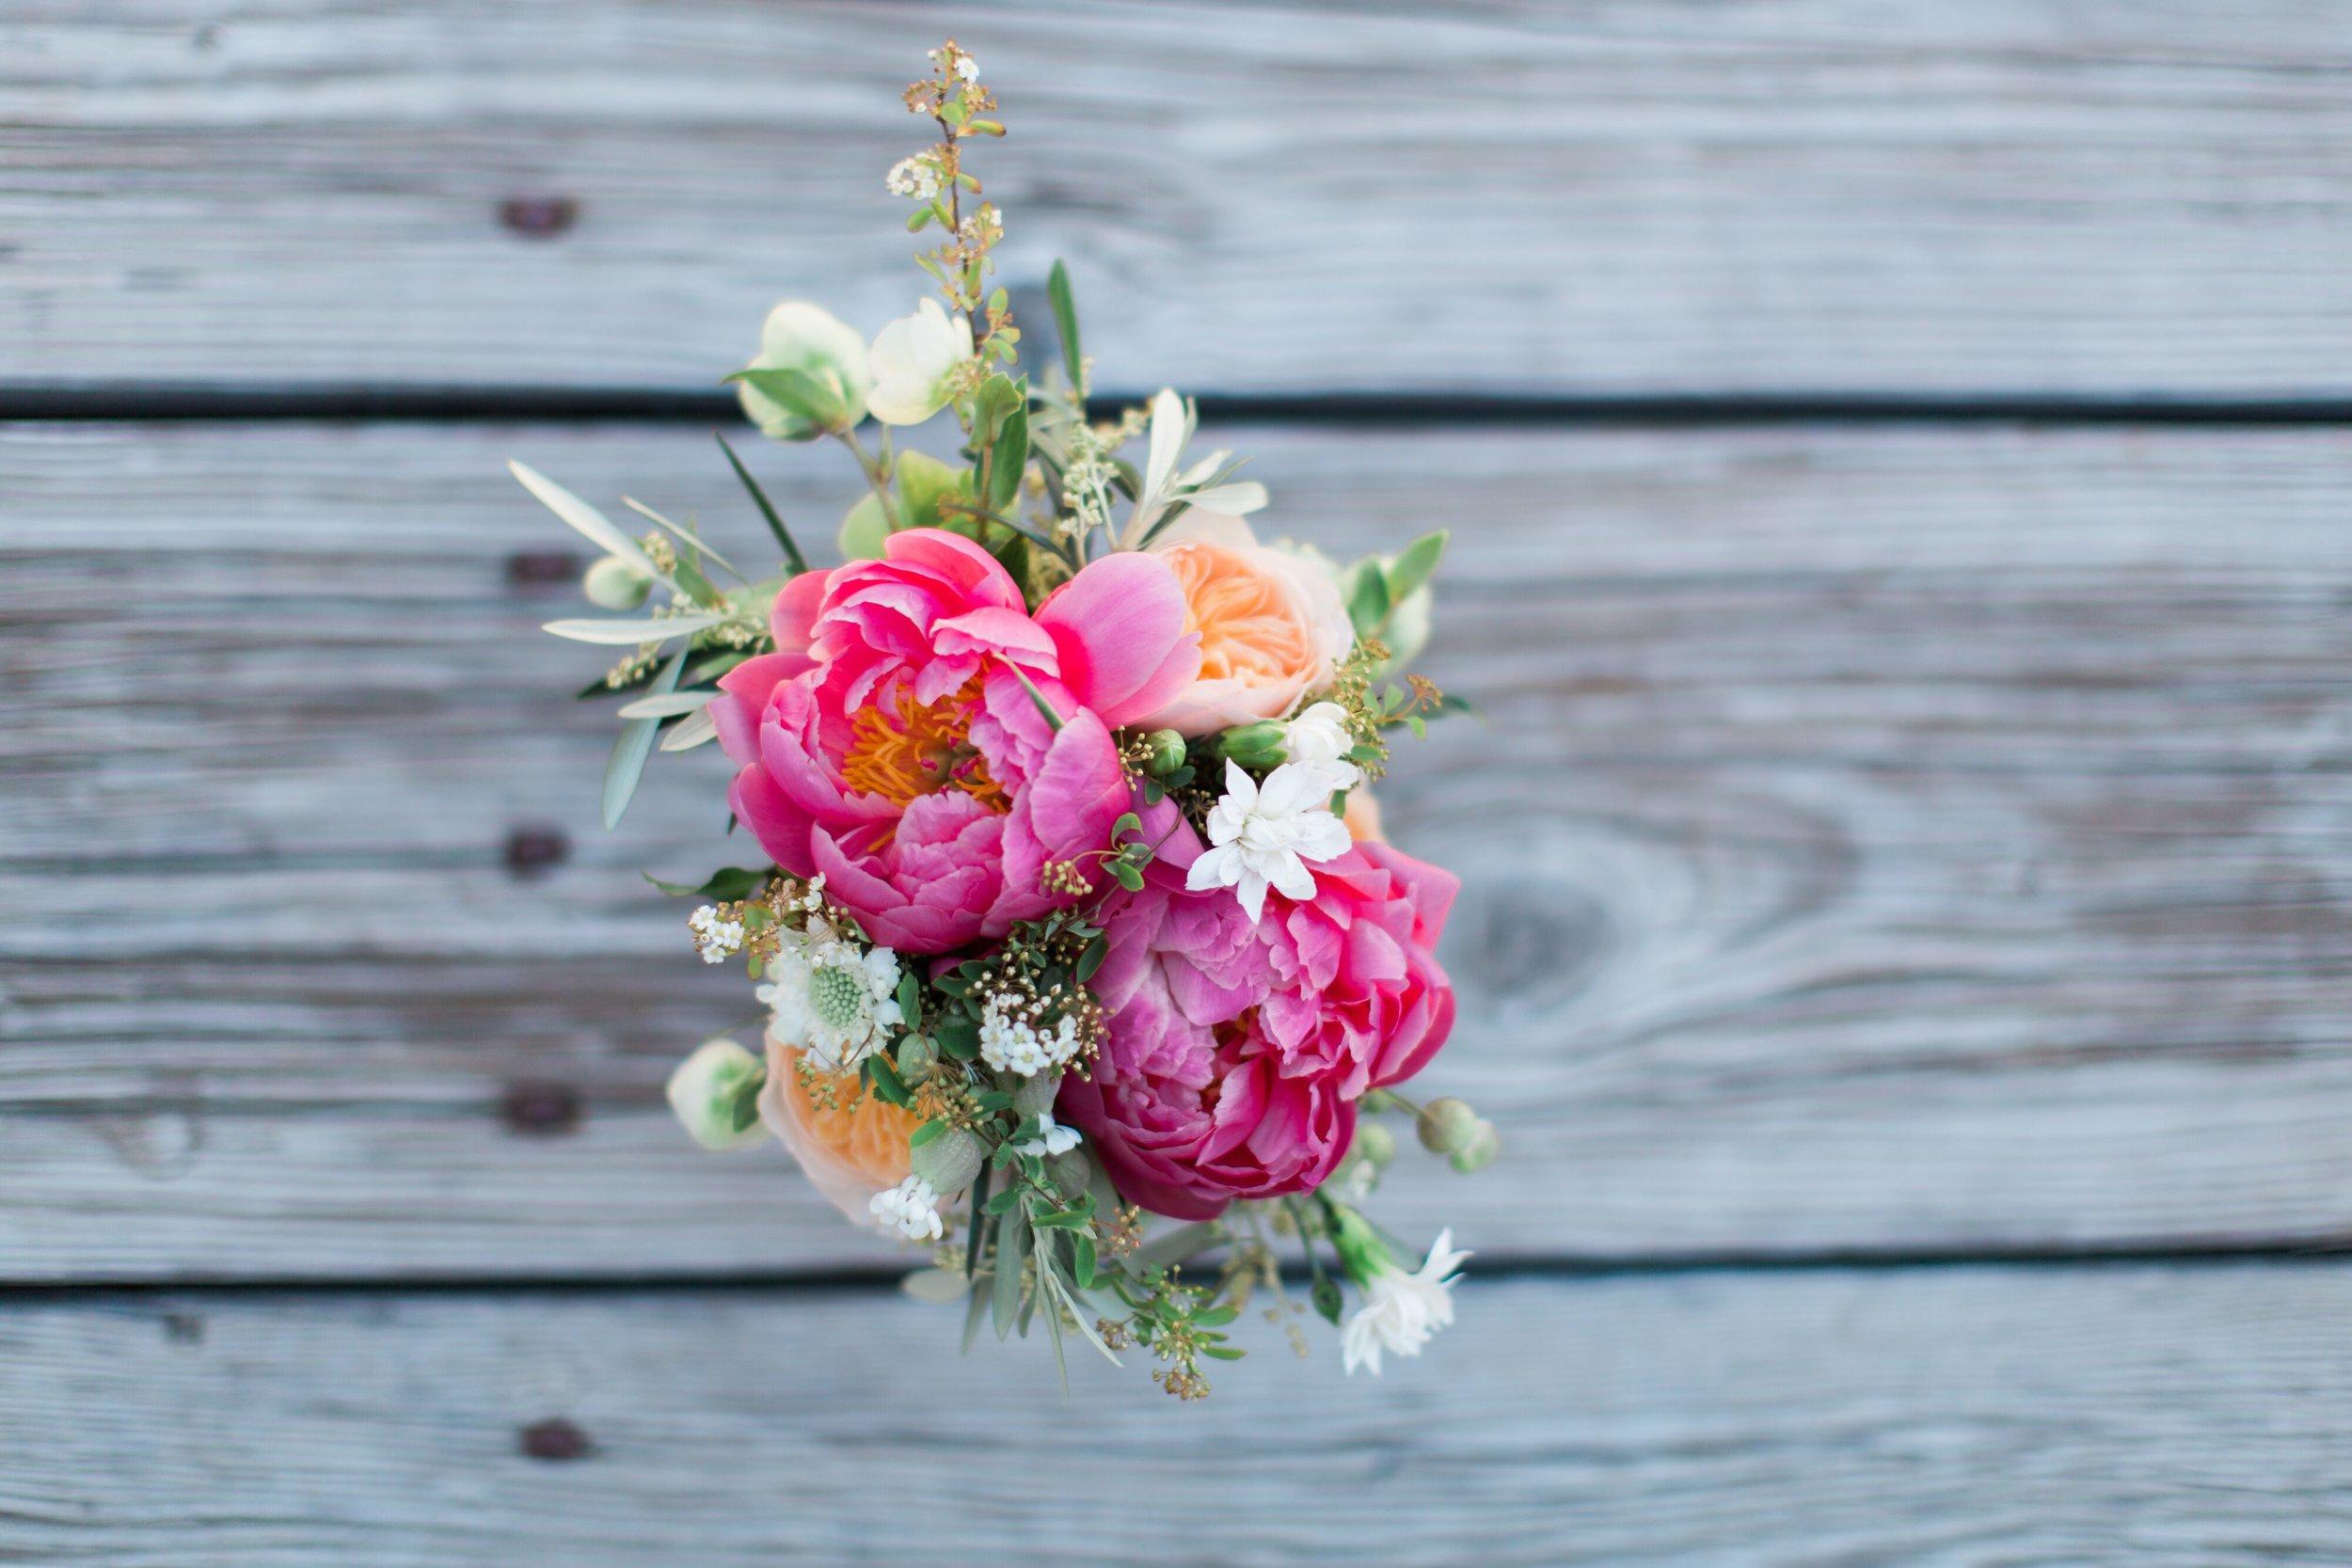 www.santabarbarawedding.com | Kiel Rucker Photography | Joelle Charming Wedding Planner | Figueroa Mountain Farmhouse | Ella & Louie Flowers | Wedding Flowers